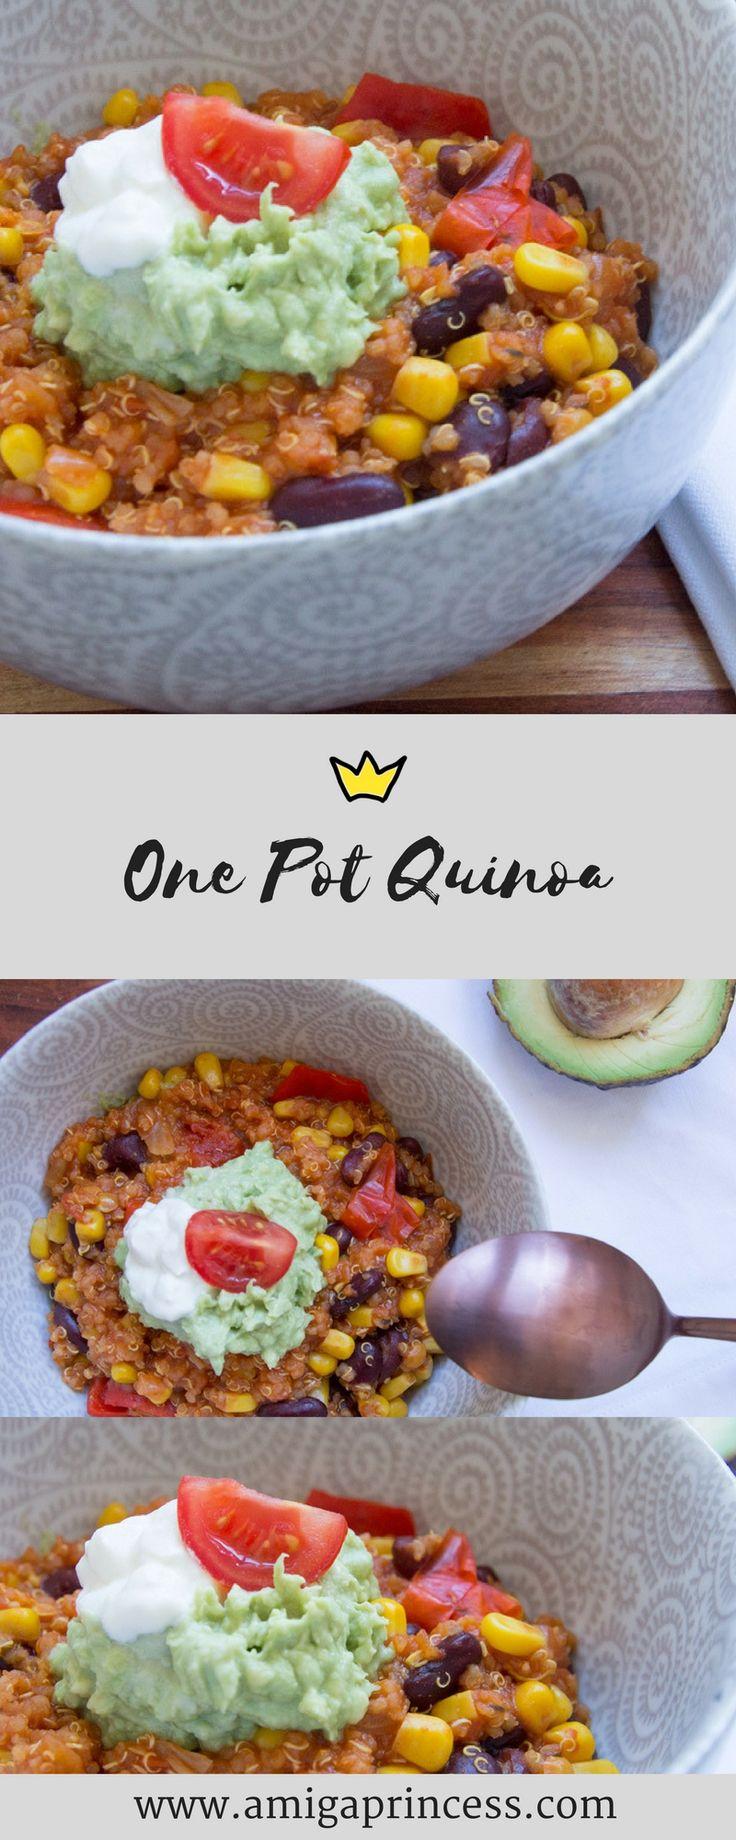 One Pot Quinoa, mexikanisch, chili sin carne, mexican style, inspo, idea, veggie, vegan, beans, corn, bohnen, eintopf, guacamole, tomatoes, einfach und schnell, quick, rezept, recipe, amigaprincess